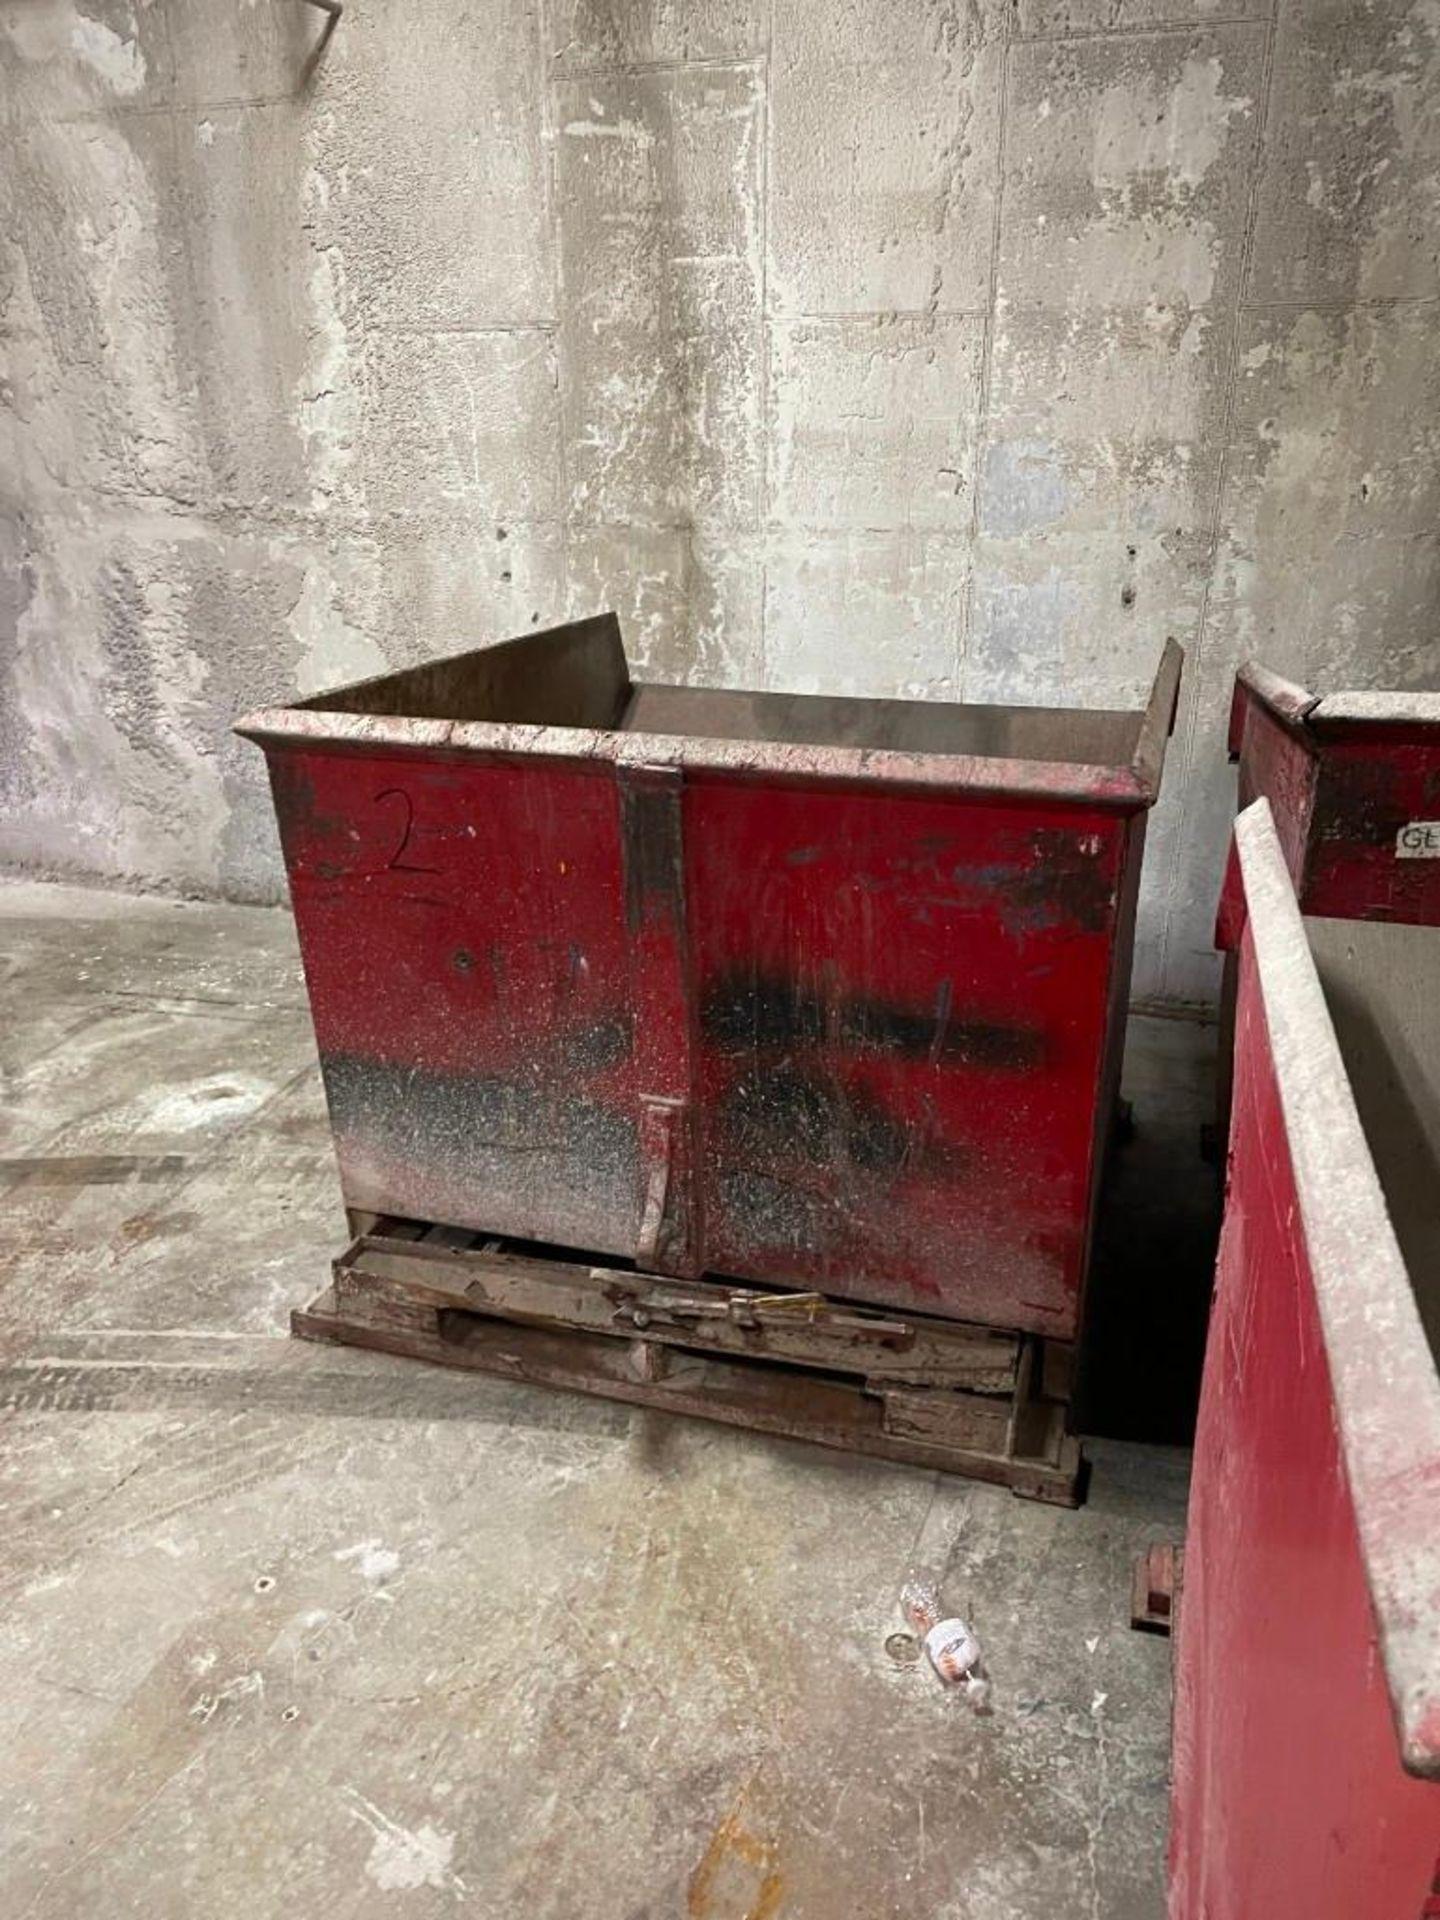 Red Self-Dumping Hopper 95 Cubic Feet - Image 3 of 4